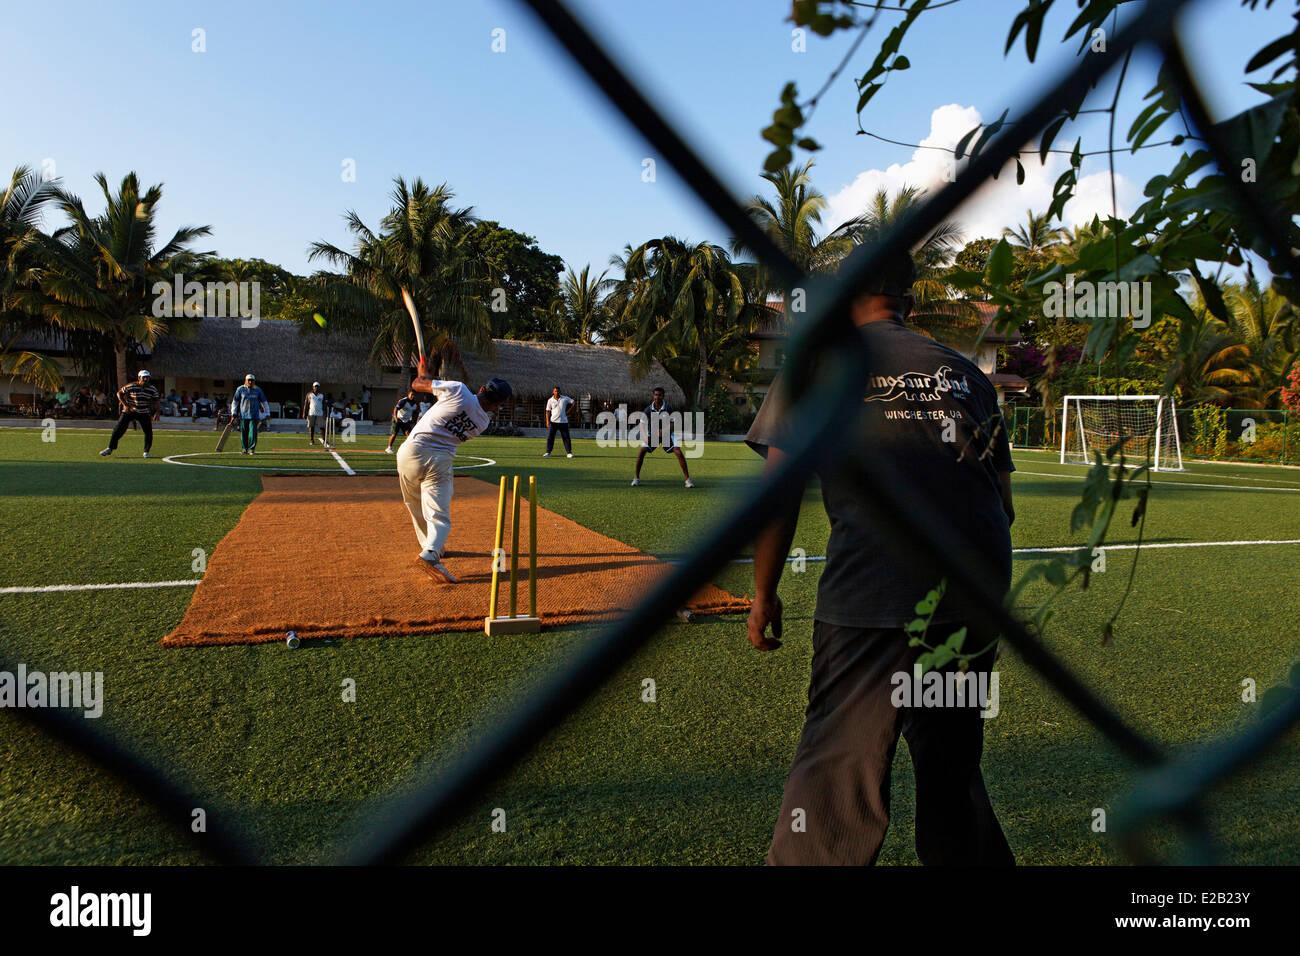 Maldives, Atoll Rasdhoo, Kuramathi hotel, cricket game - Stock Image